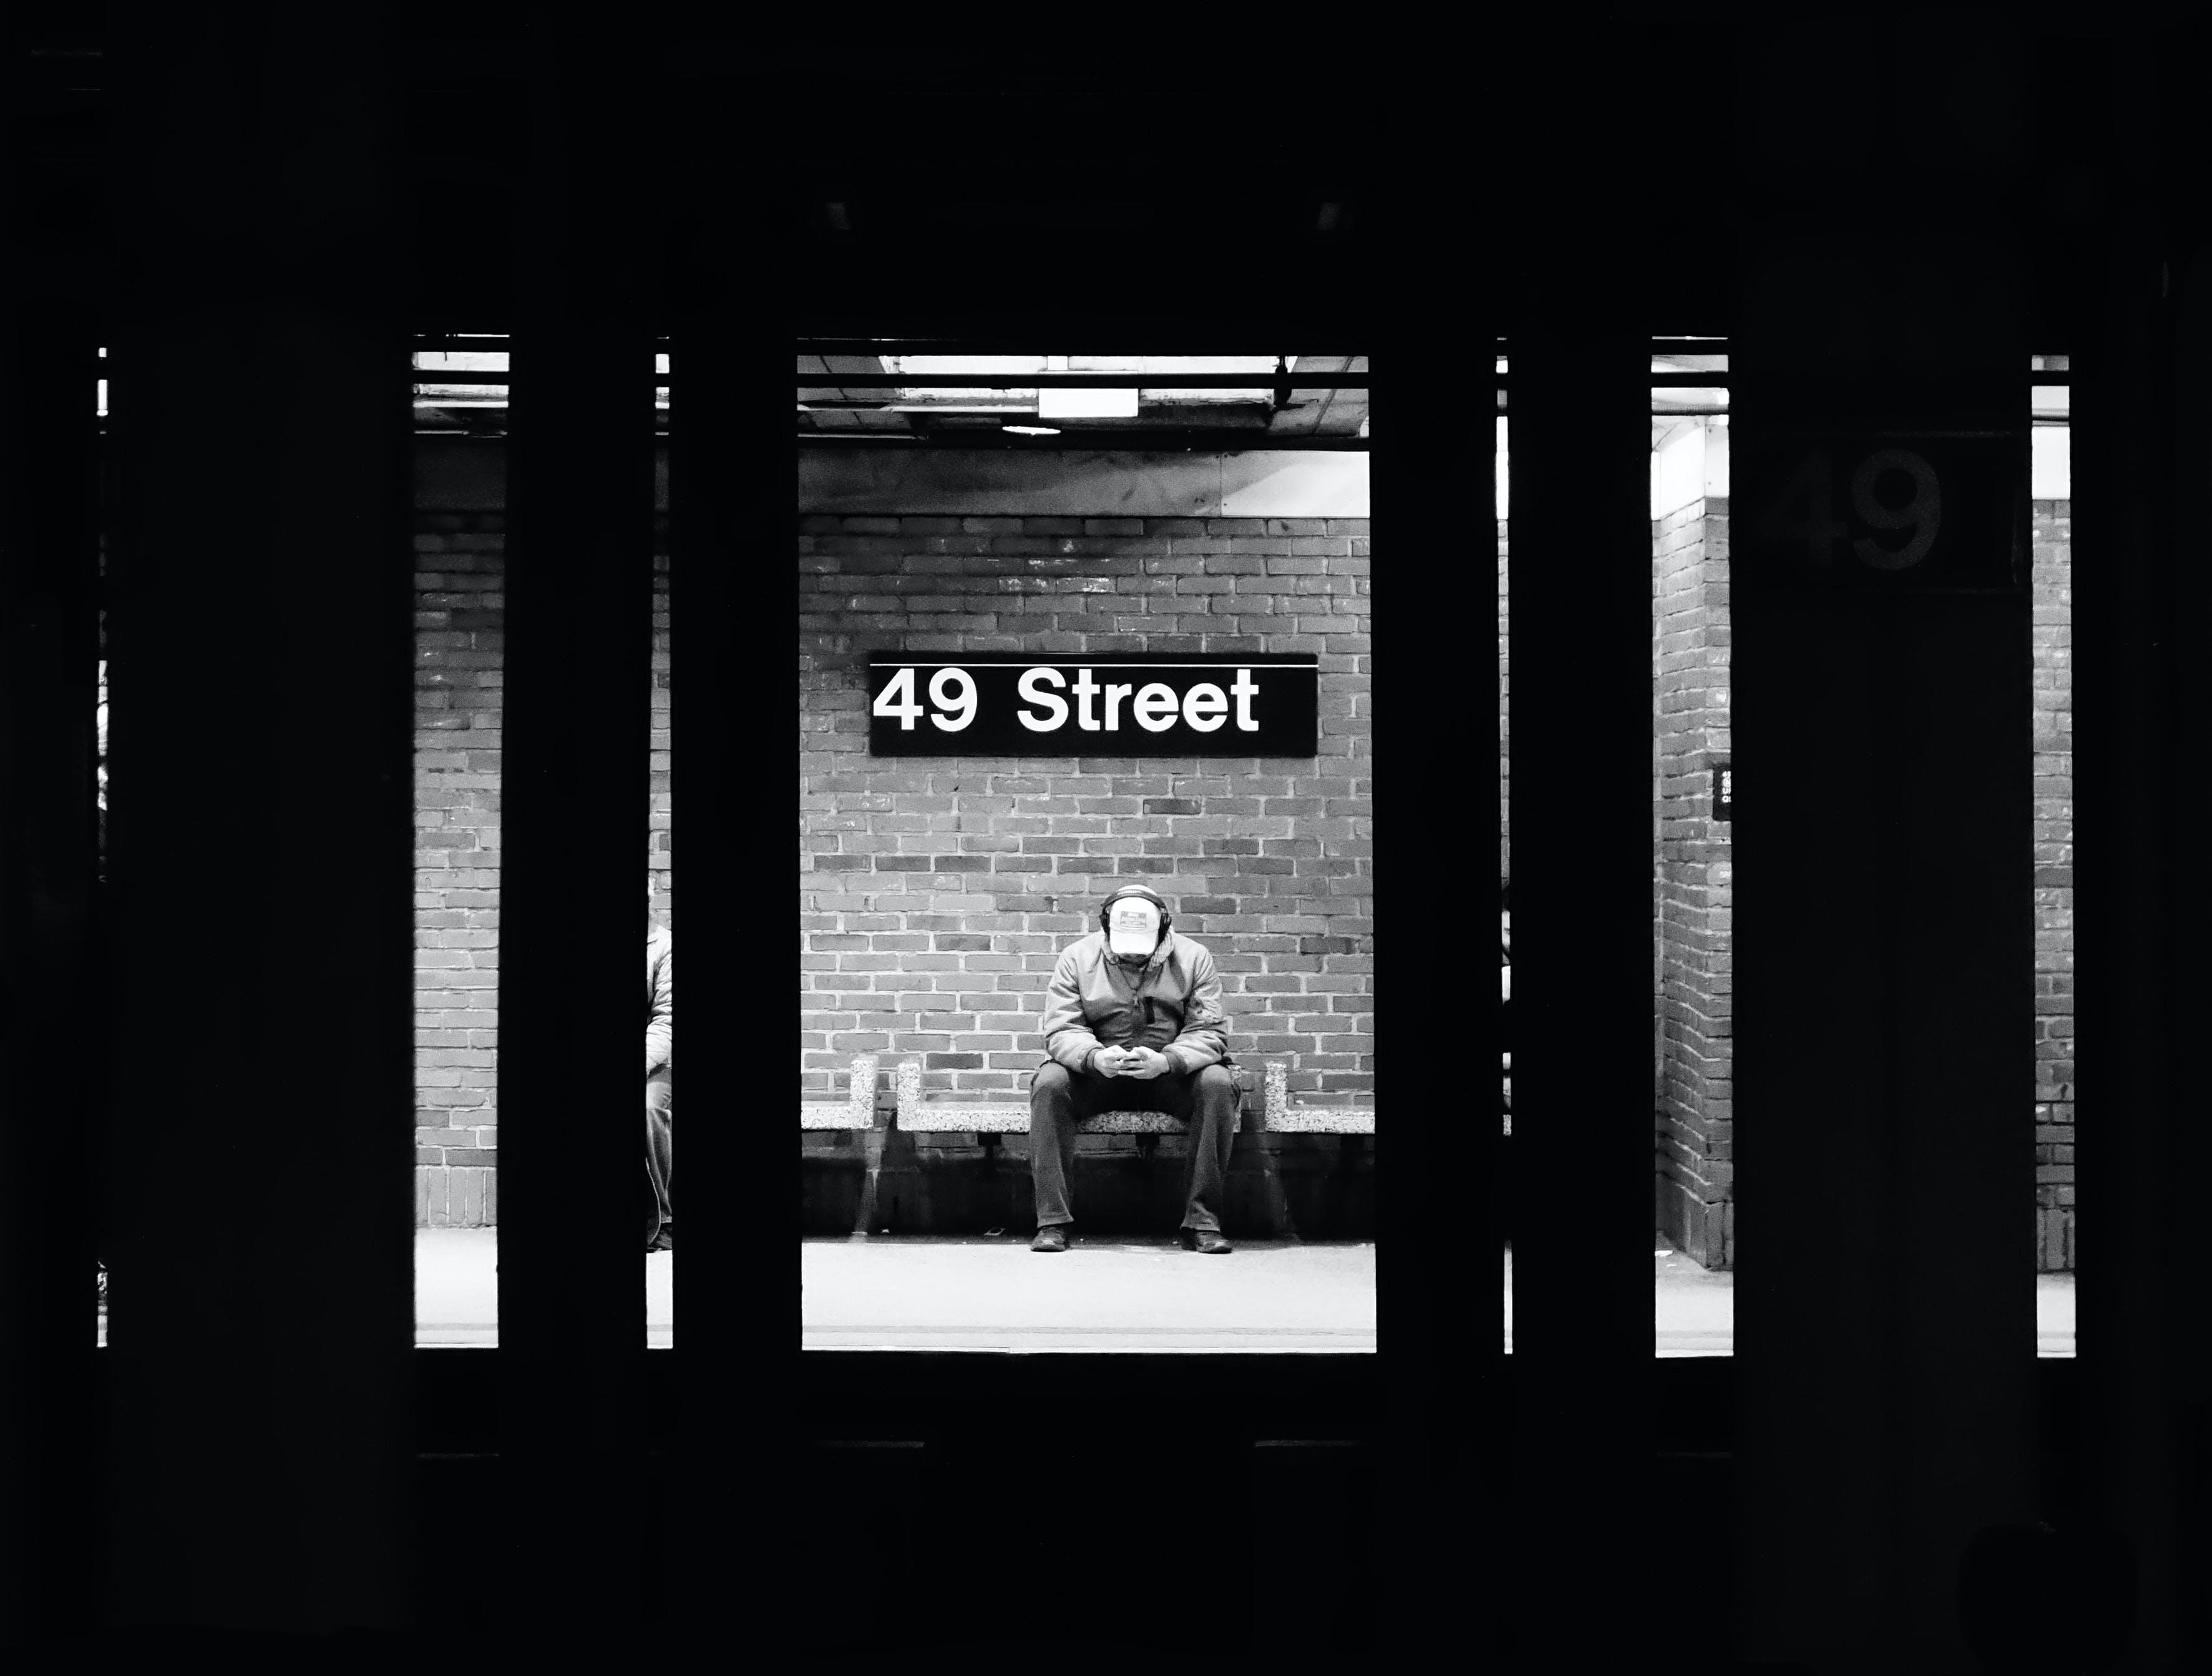 Kostenloses Stock Foto zu new york city, u-bahnsteig